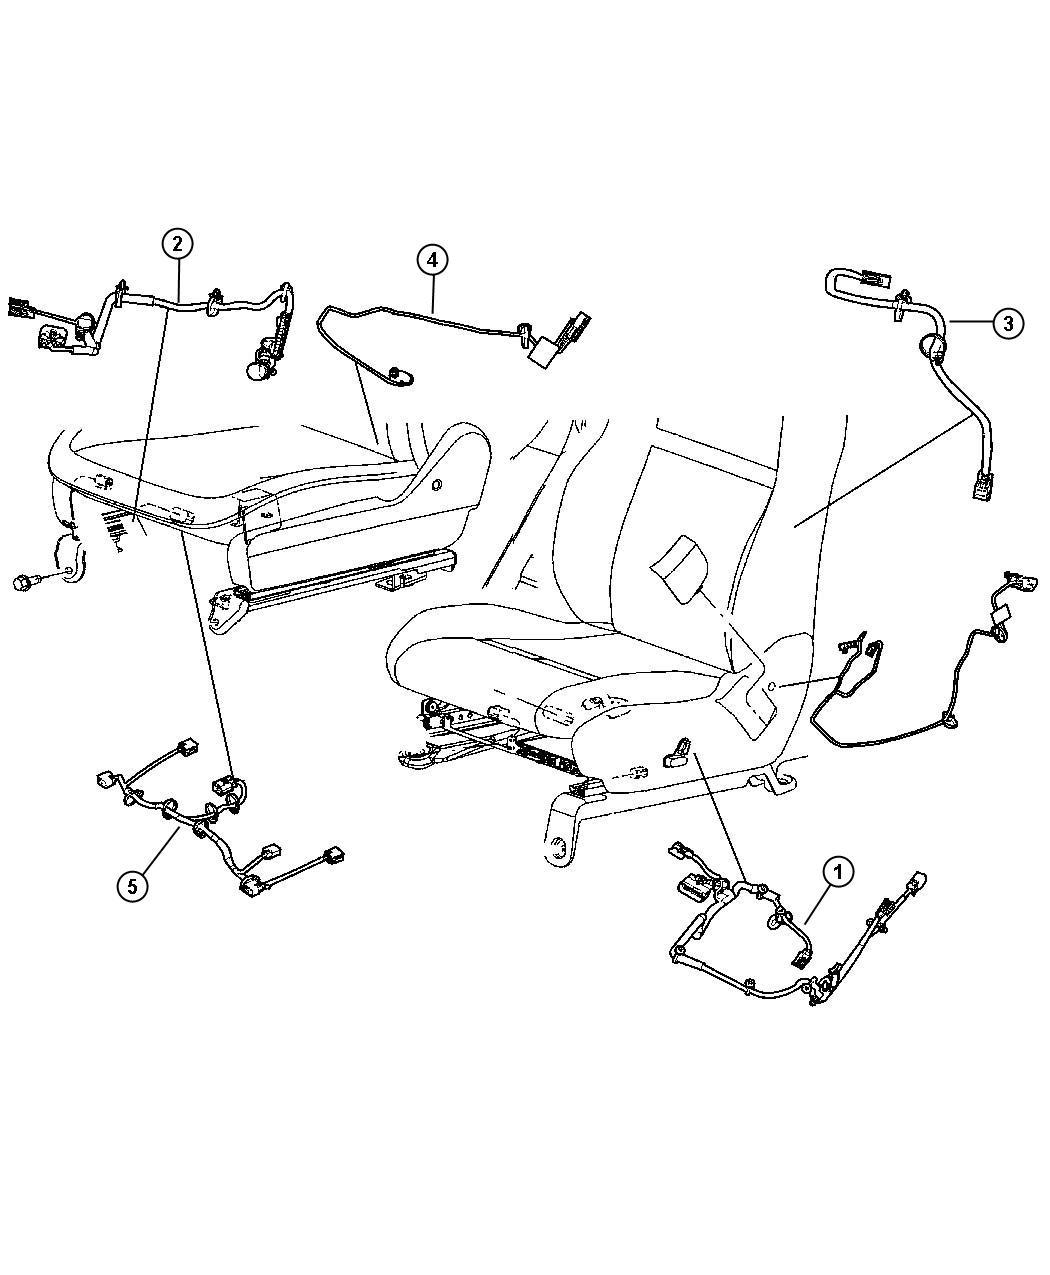 2009 Chrysler 300 Wiring. Seat. Power without memory. Trim